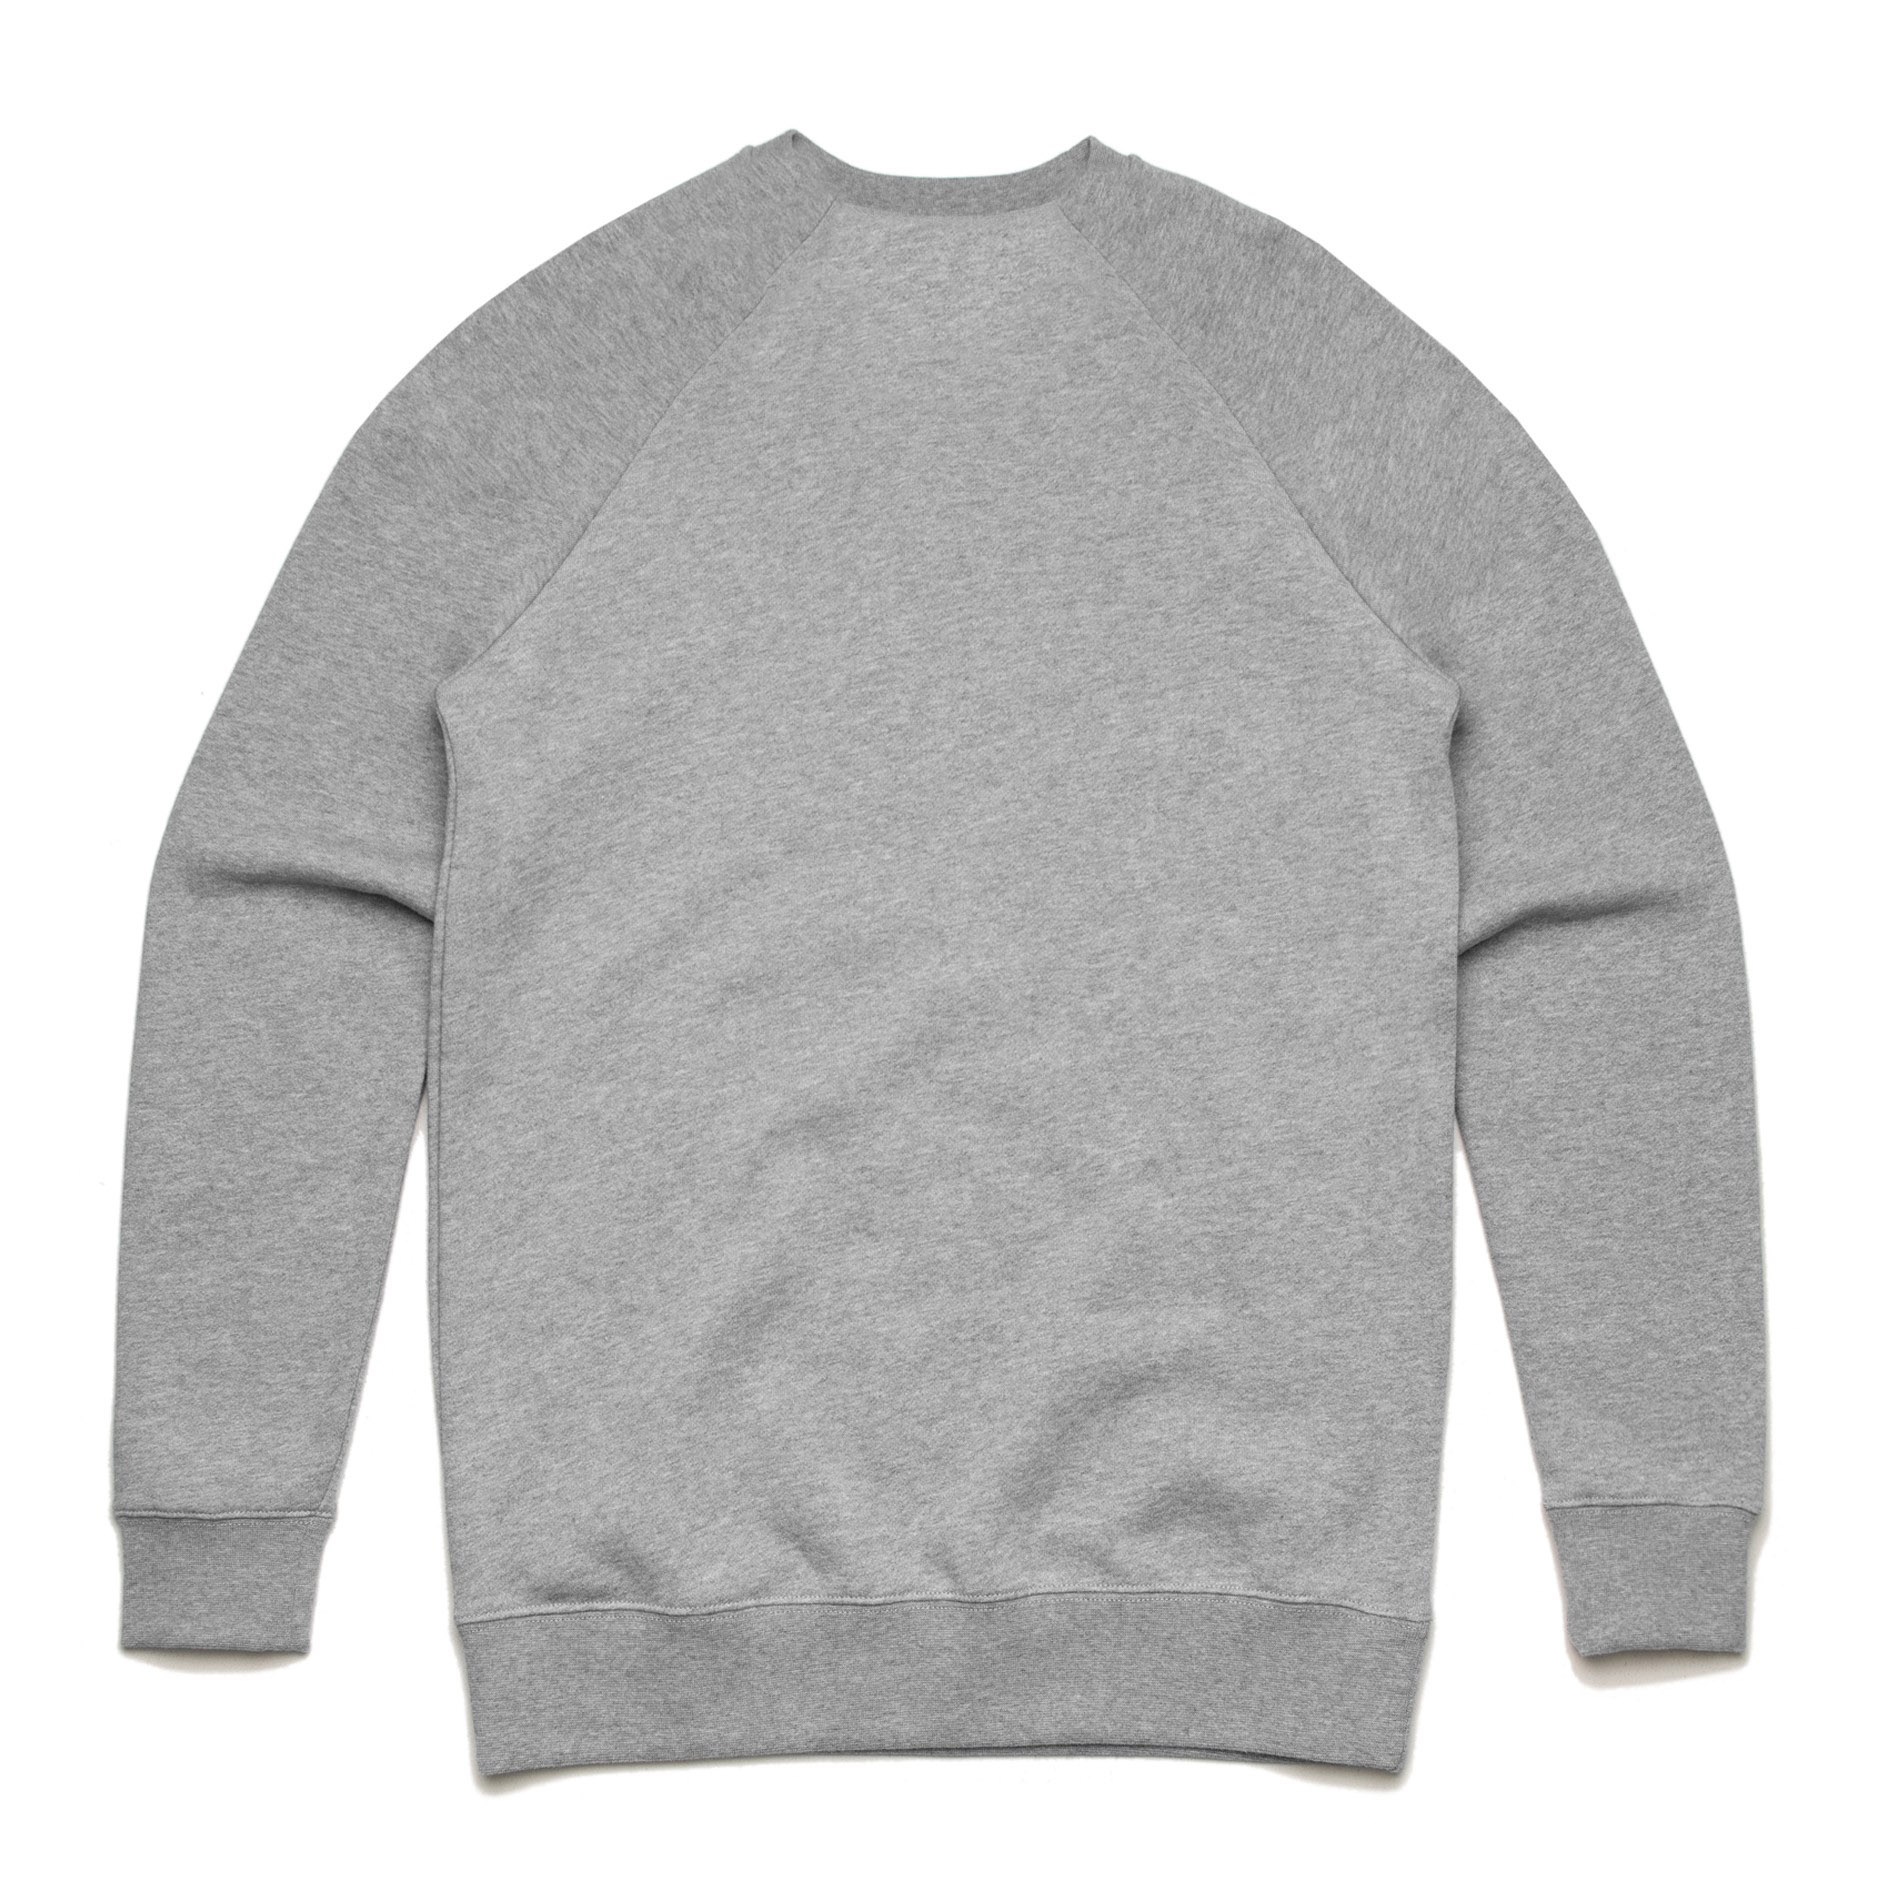 Design your t shirt nz - Unisex Box Crew T Shirt Printing Nz Design Your Own Custom Shirt New Zealand